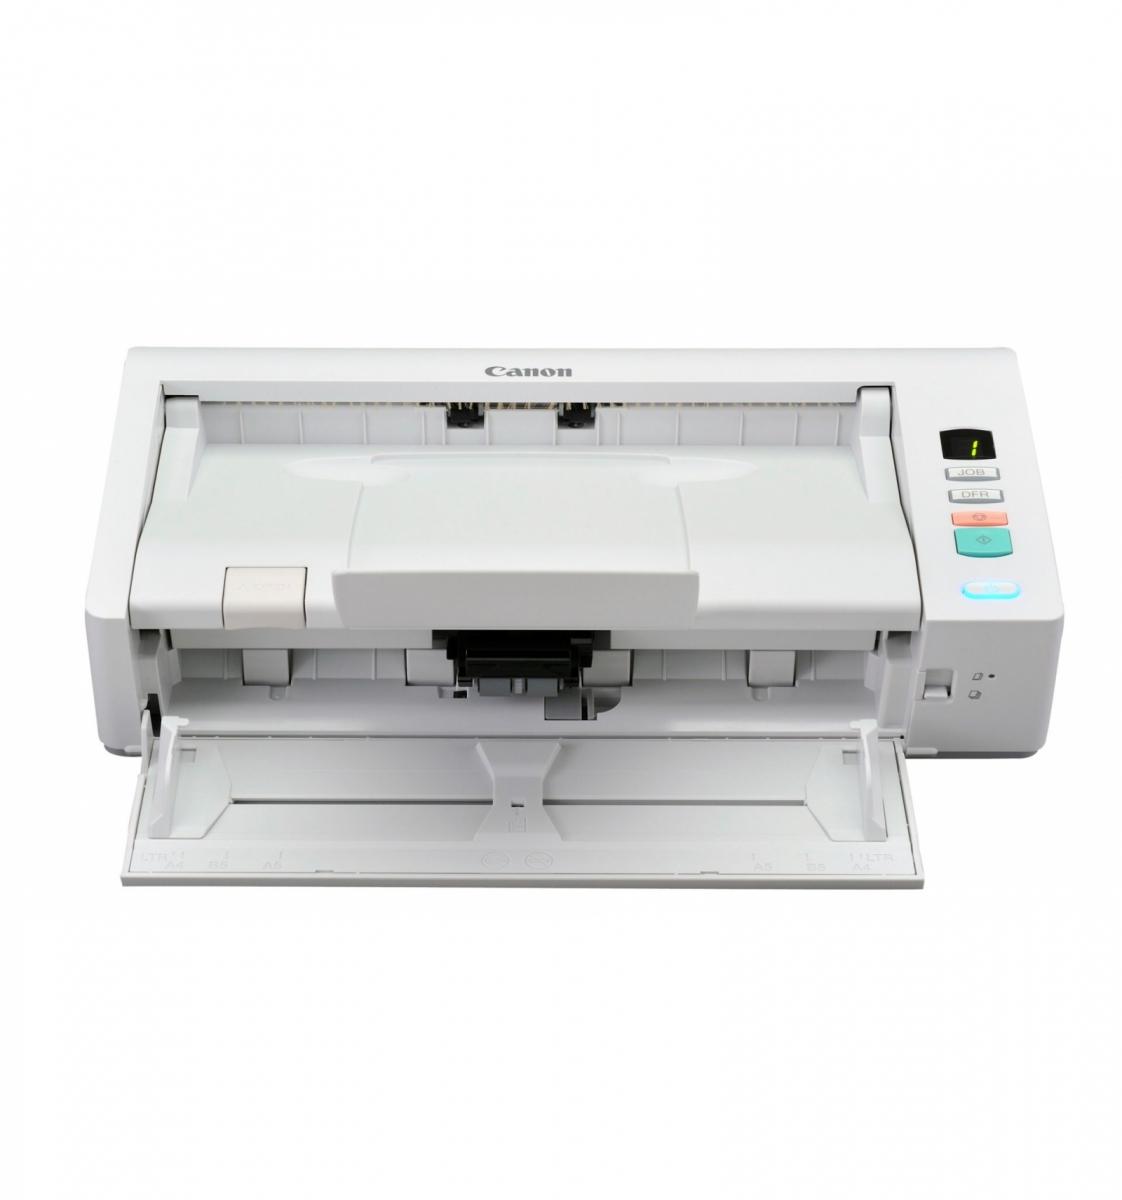 Máy scan Canon DR M-140